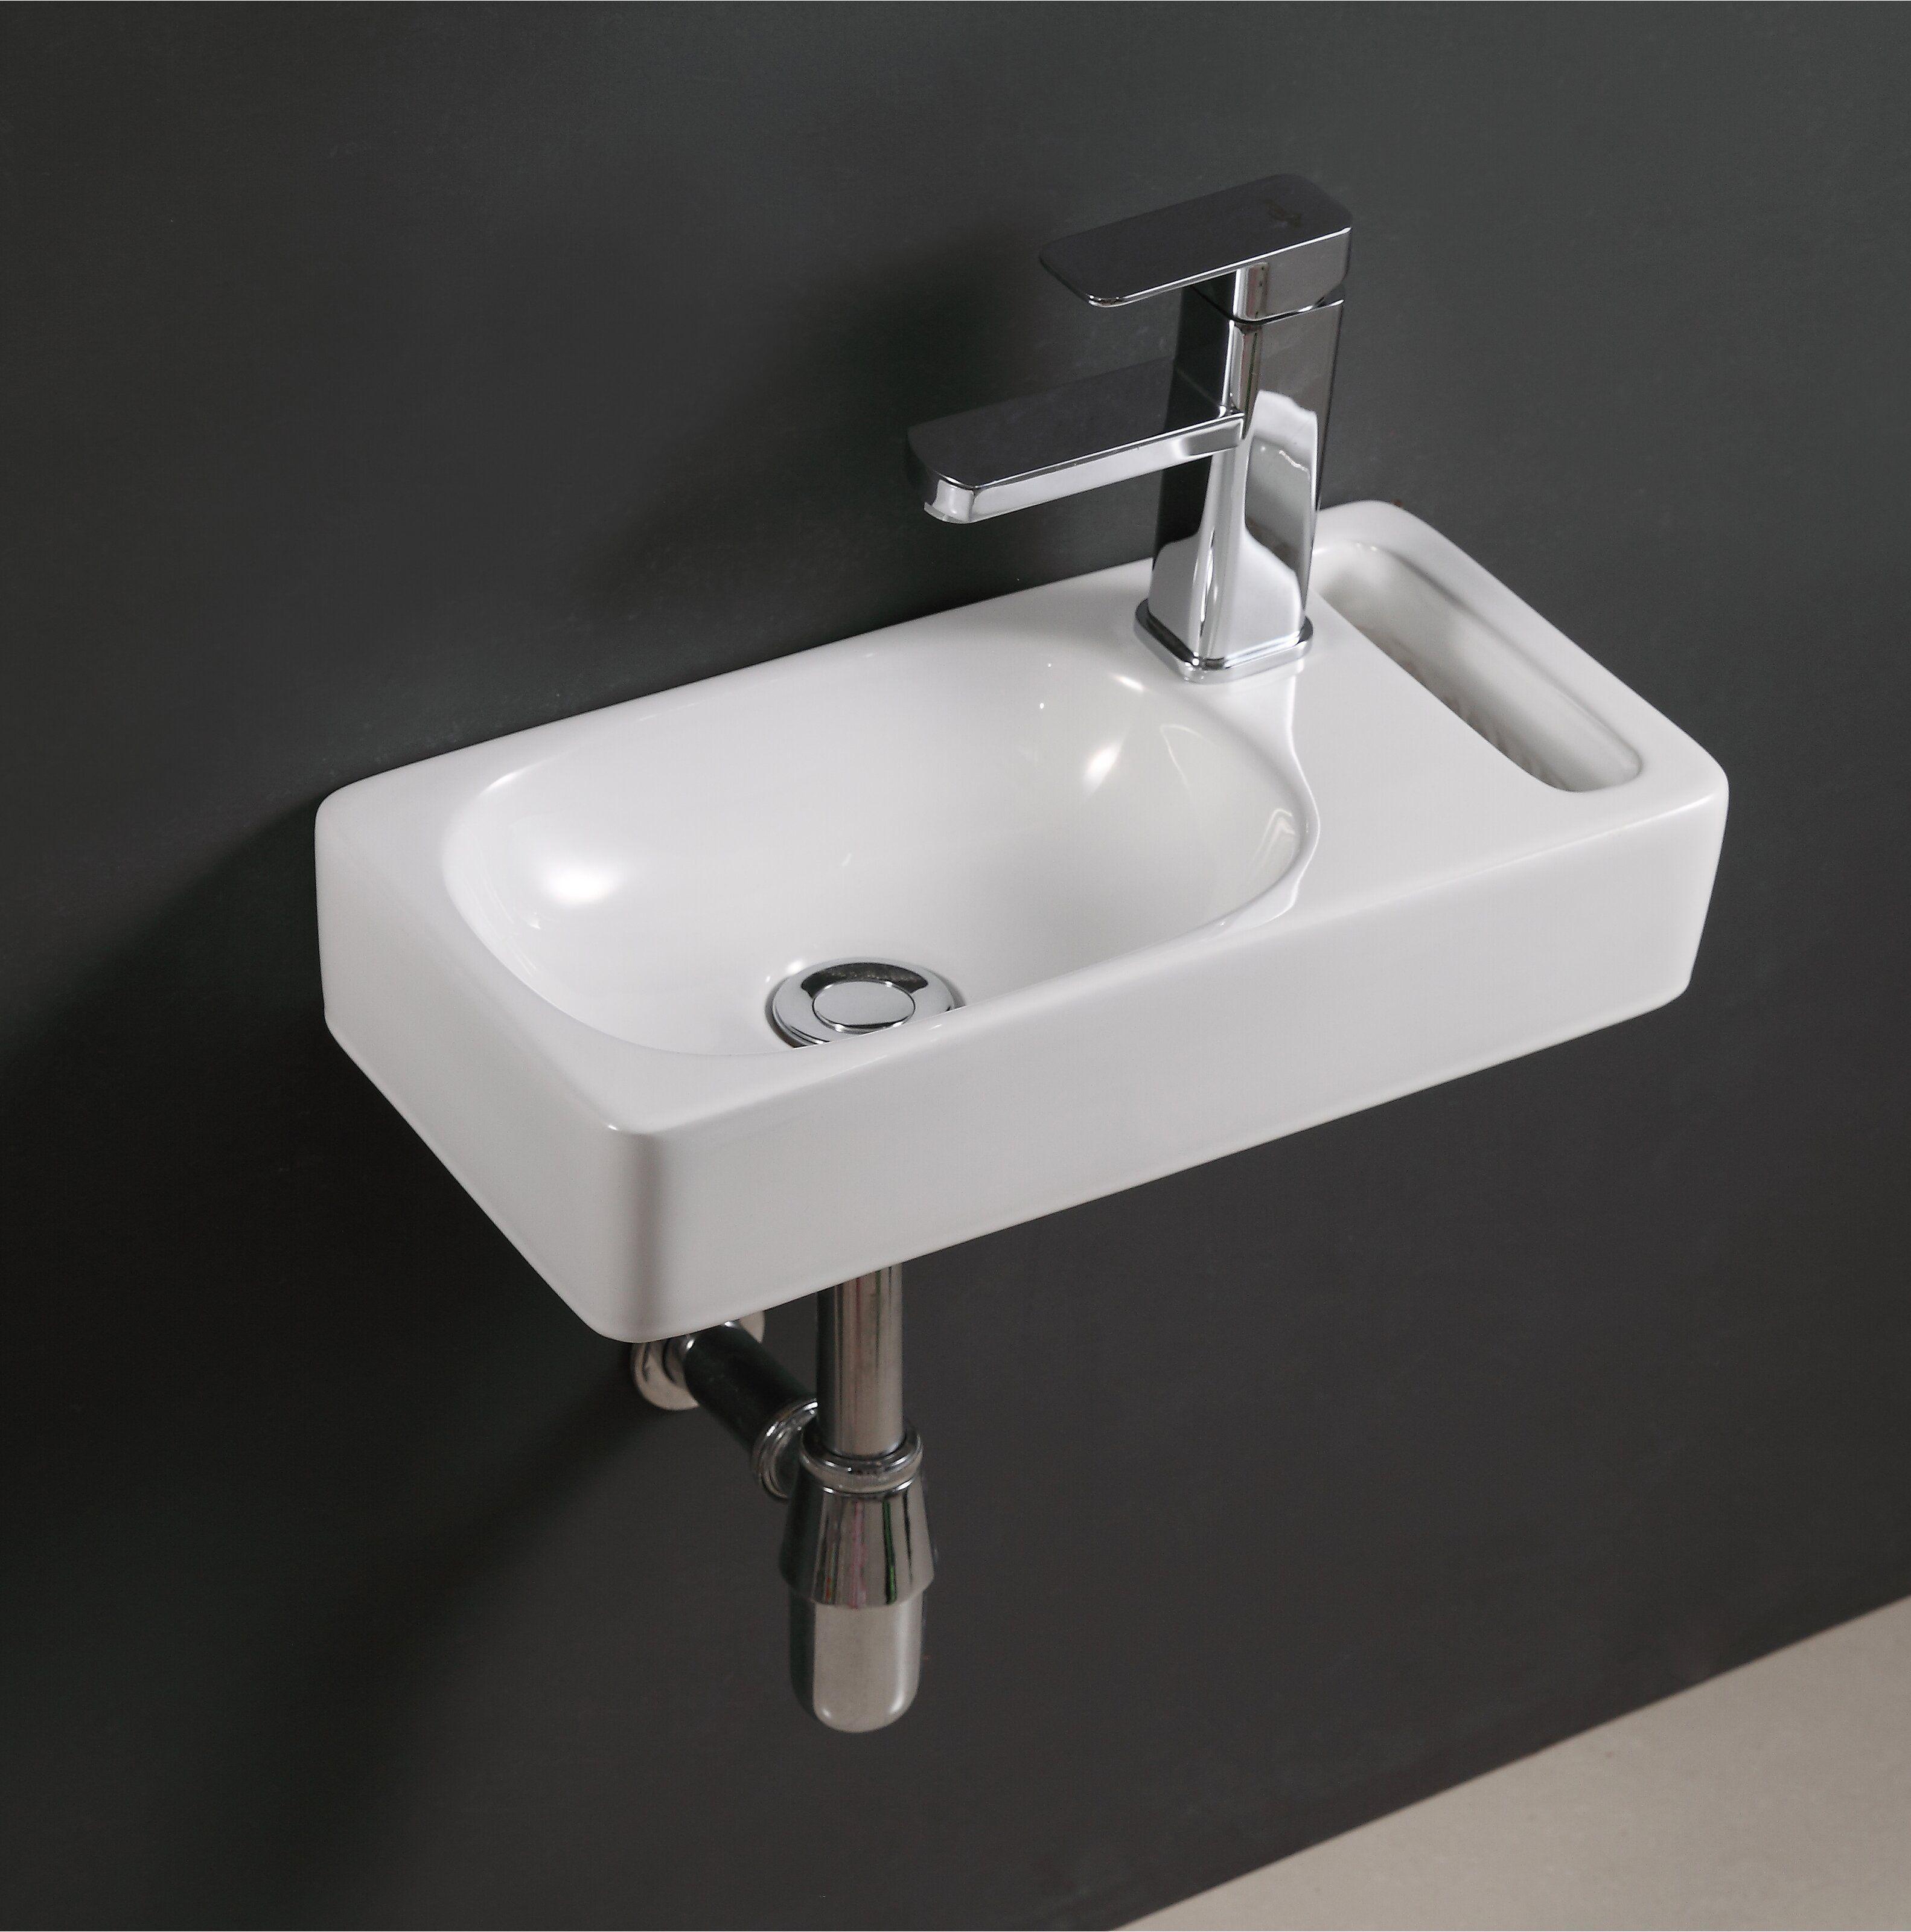 Ceramic 17 Wall Mount Bathroom Sink In 2021 Wall Mounted Bathroom Sink Small Bathroom Sinks Bathroom Sinks For Sale [ 3200 x 3166 Pixel ]